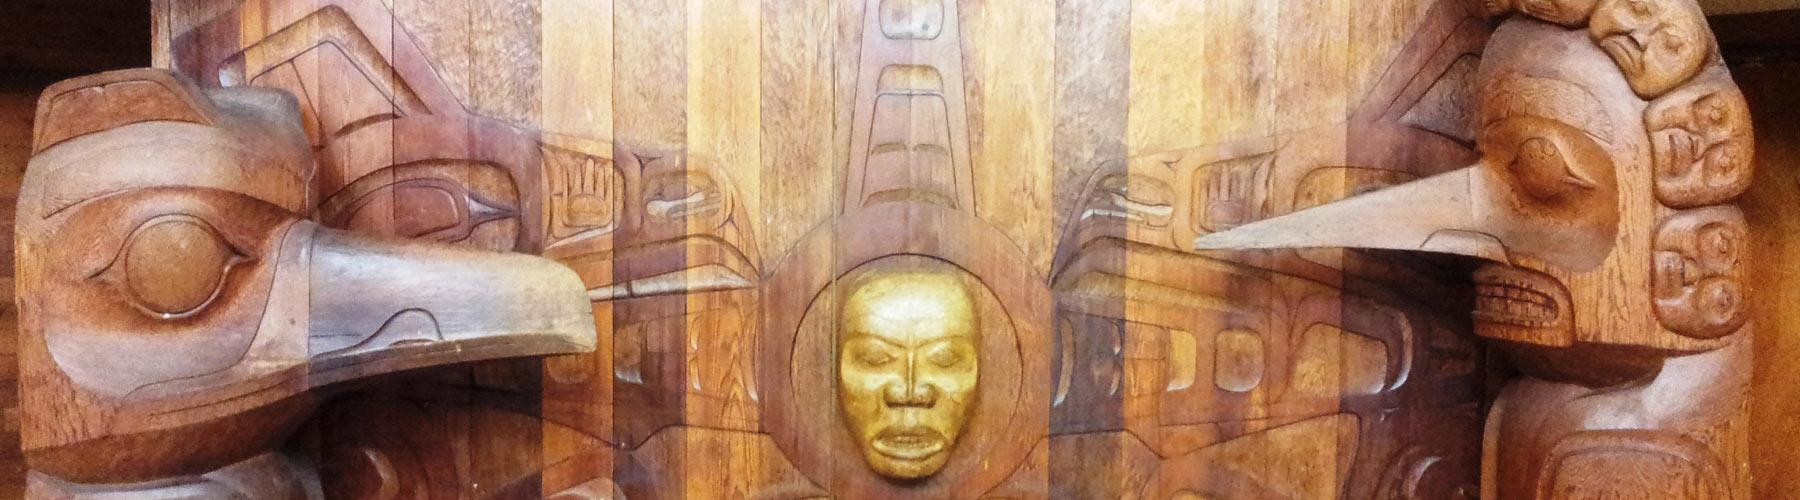 Vancouver Aboriginal Friendship Centre Society